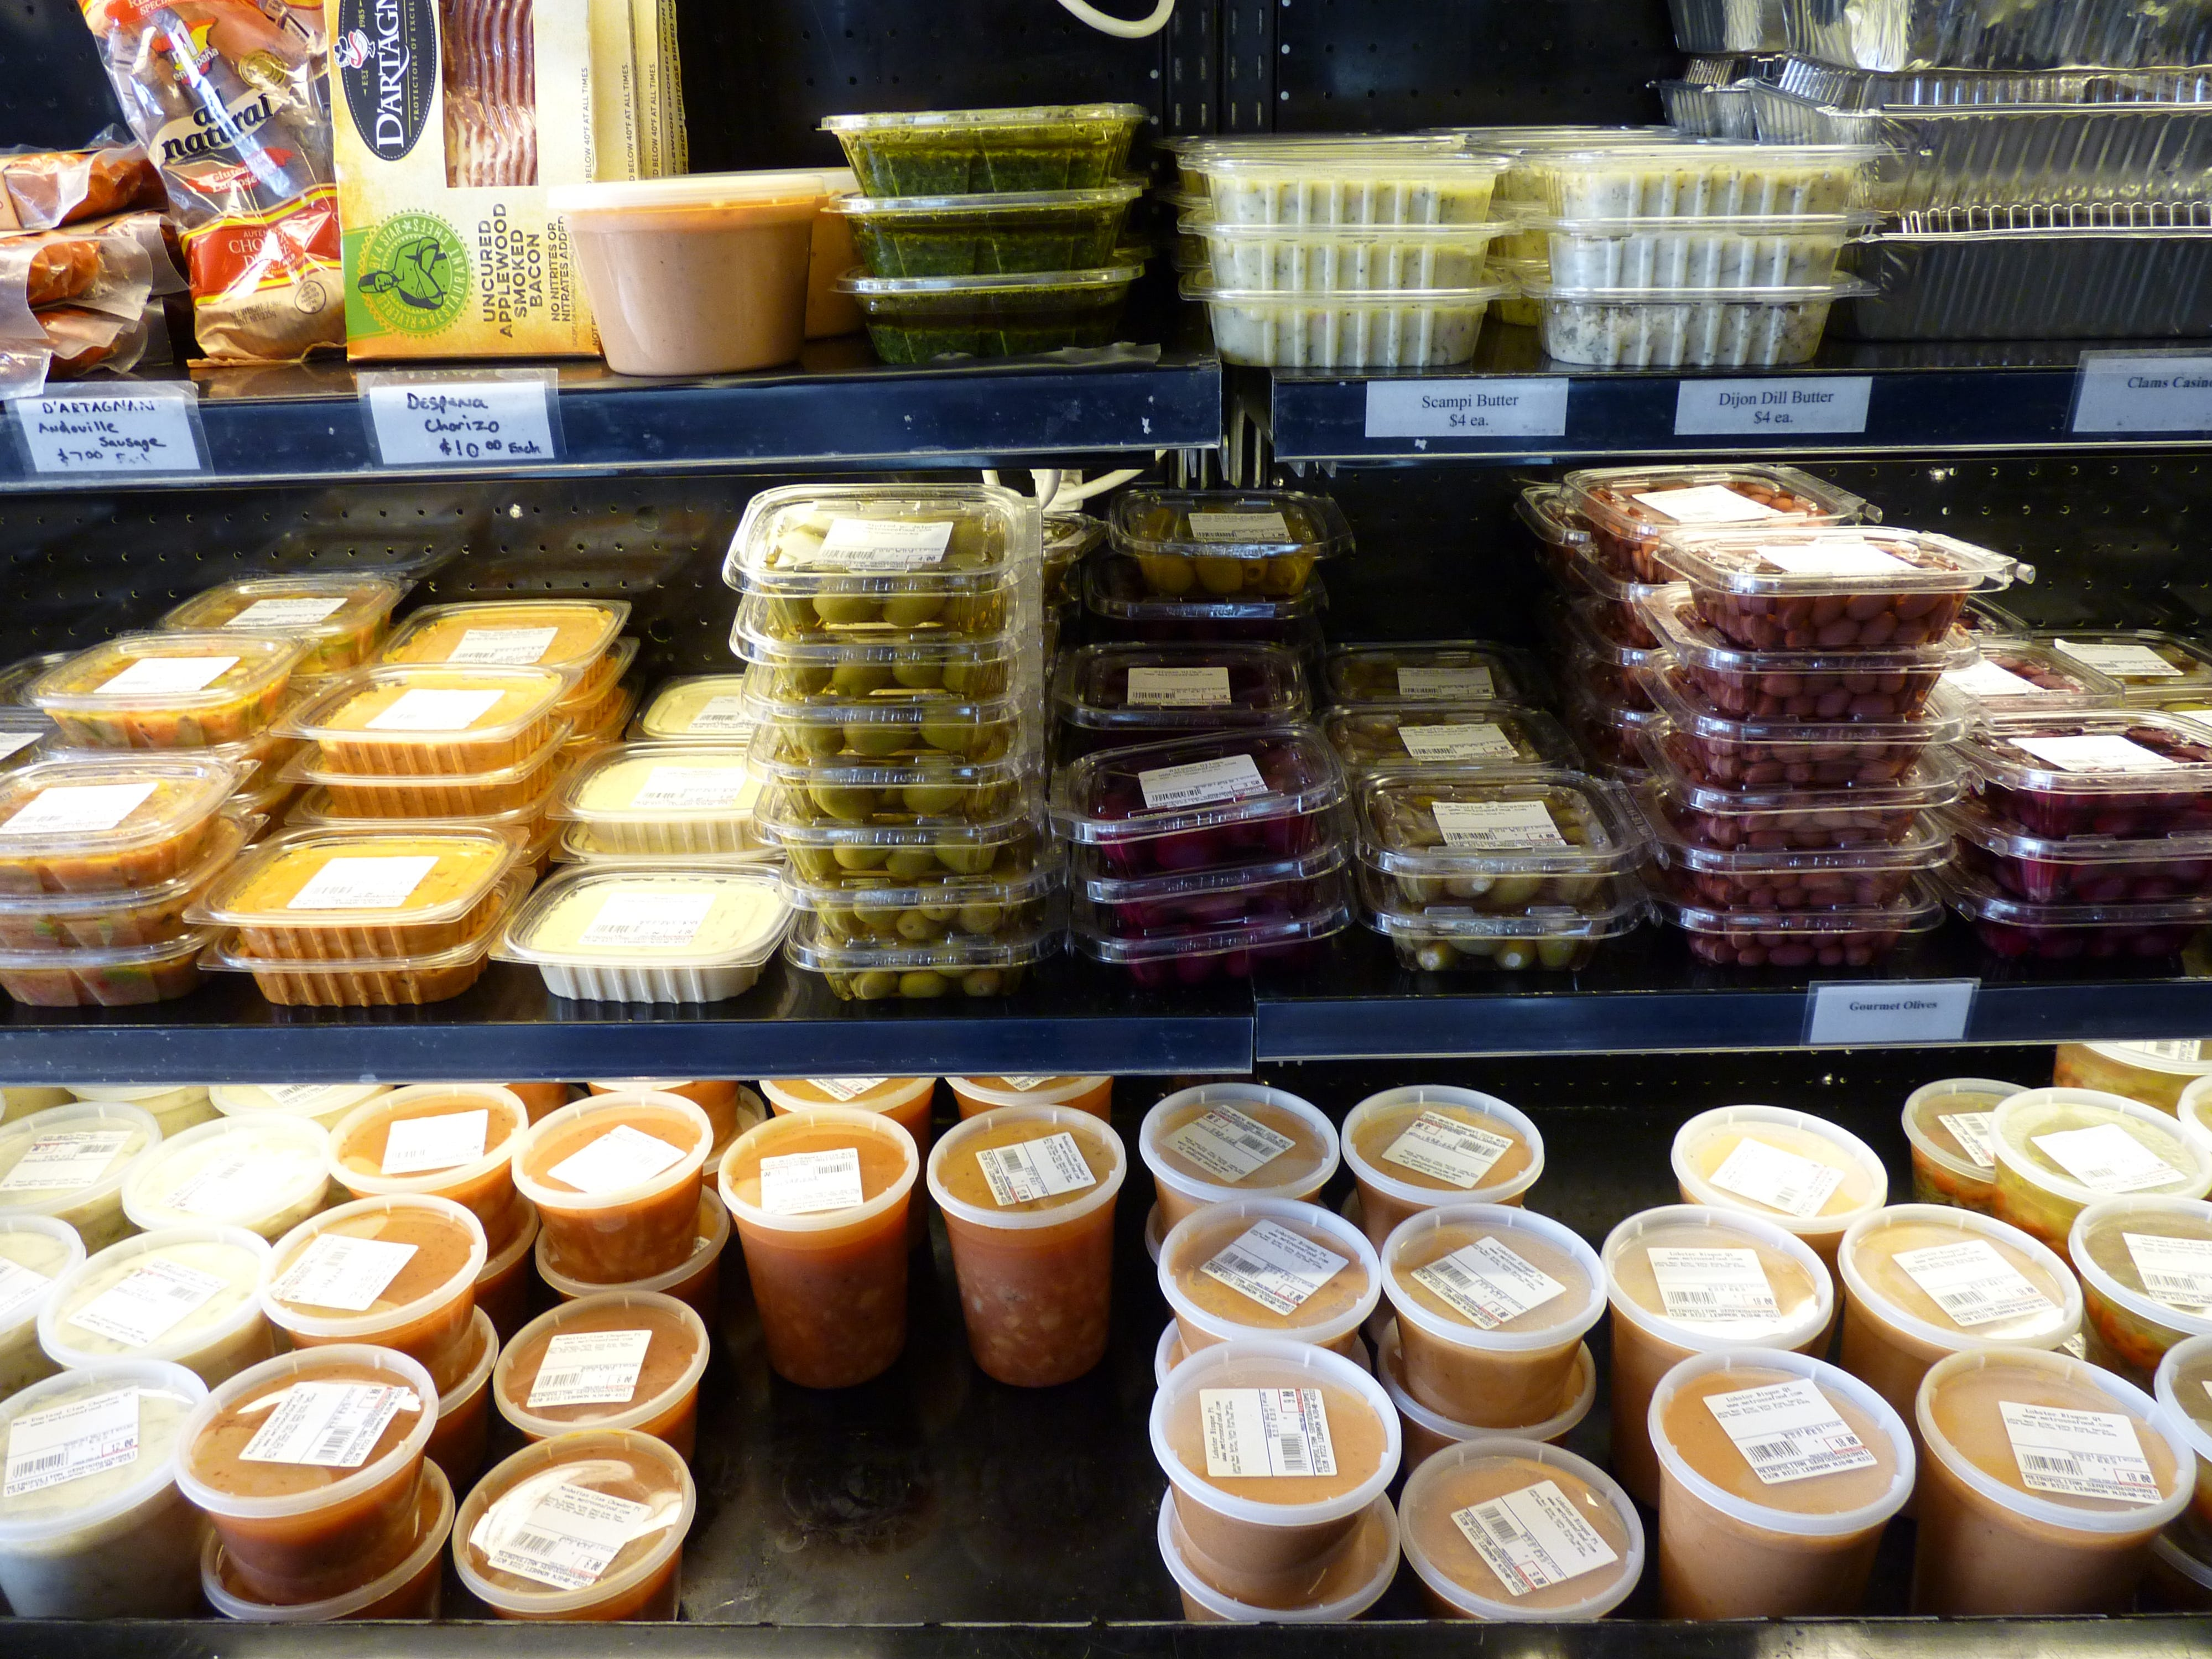 Salads and soups at Metropolitan Seafood & Gourmet in Lebanon.